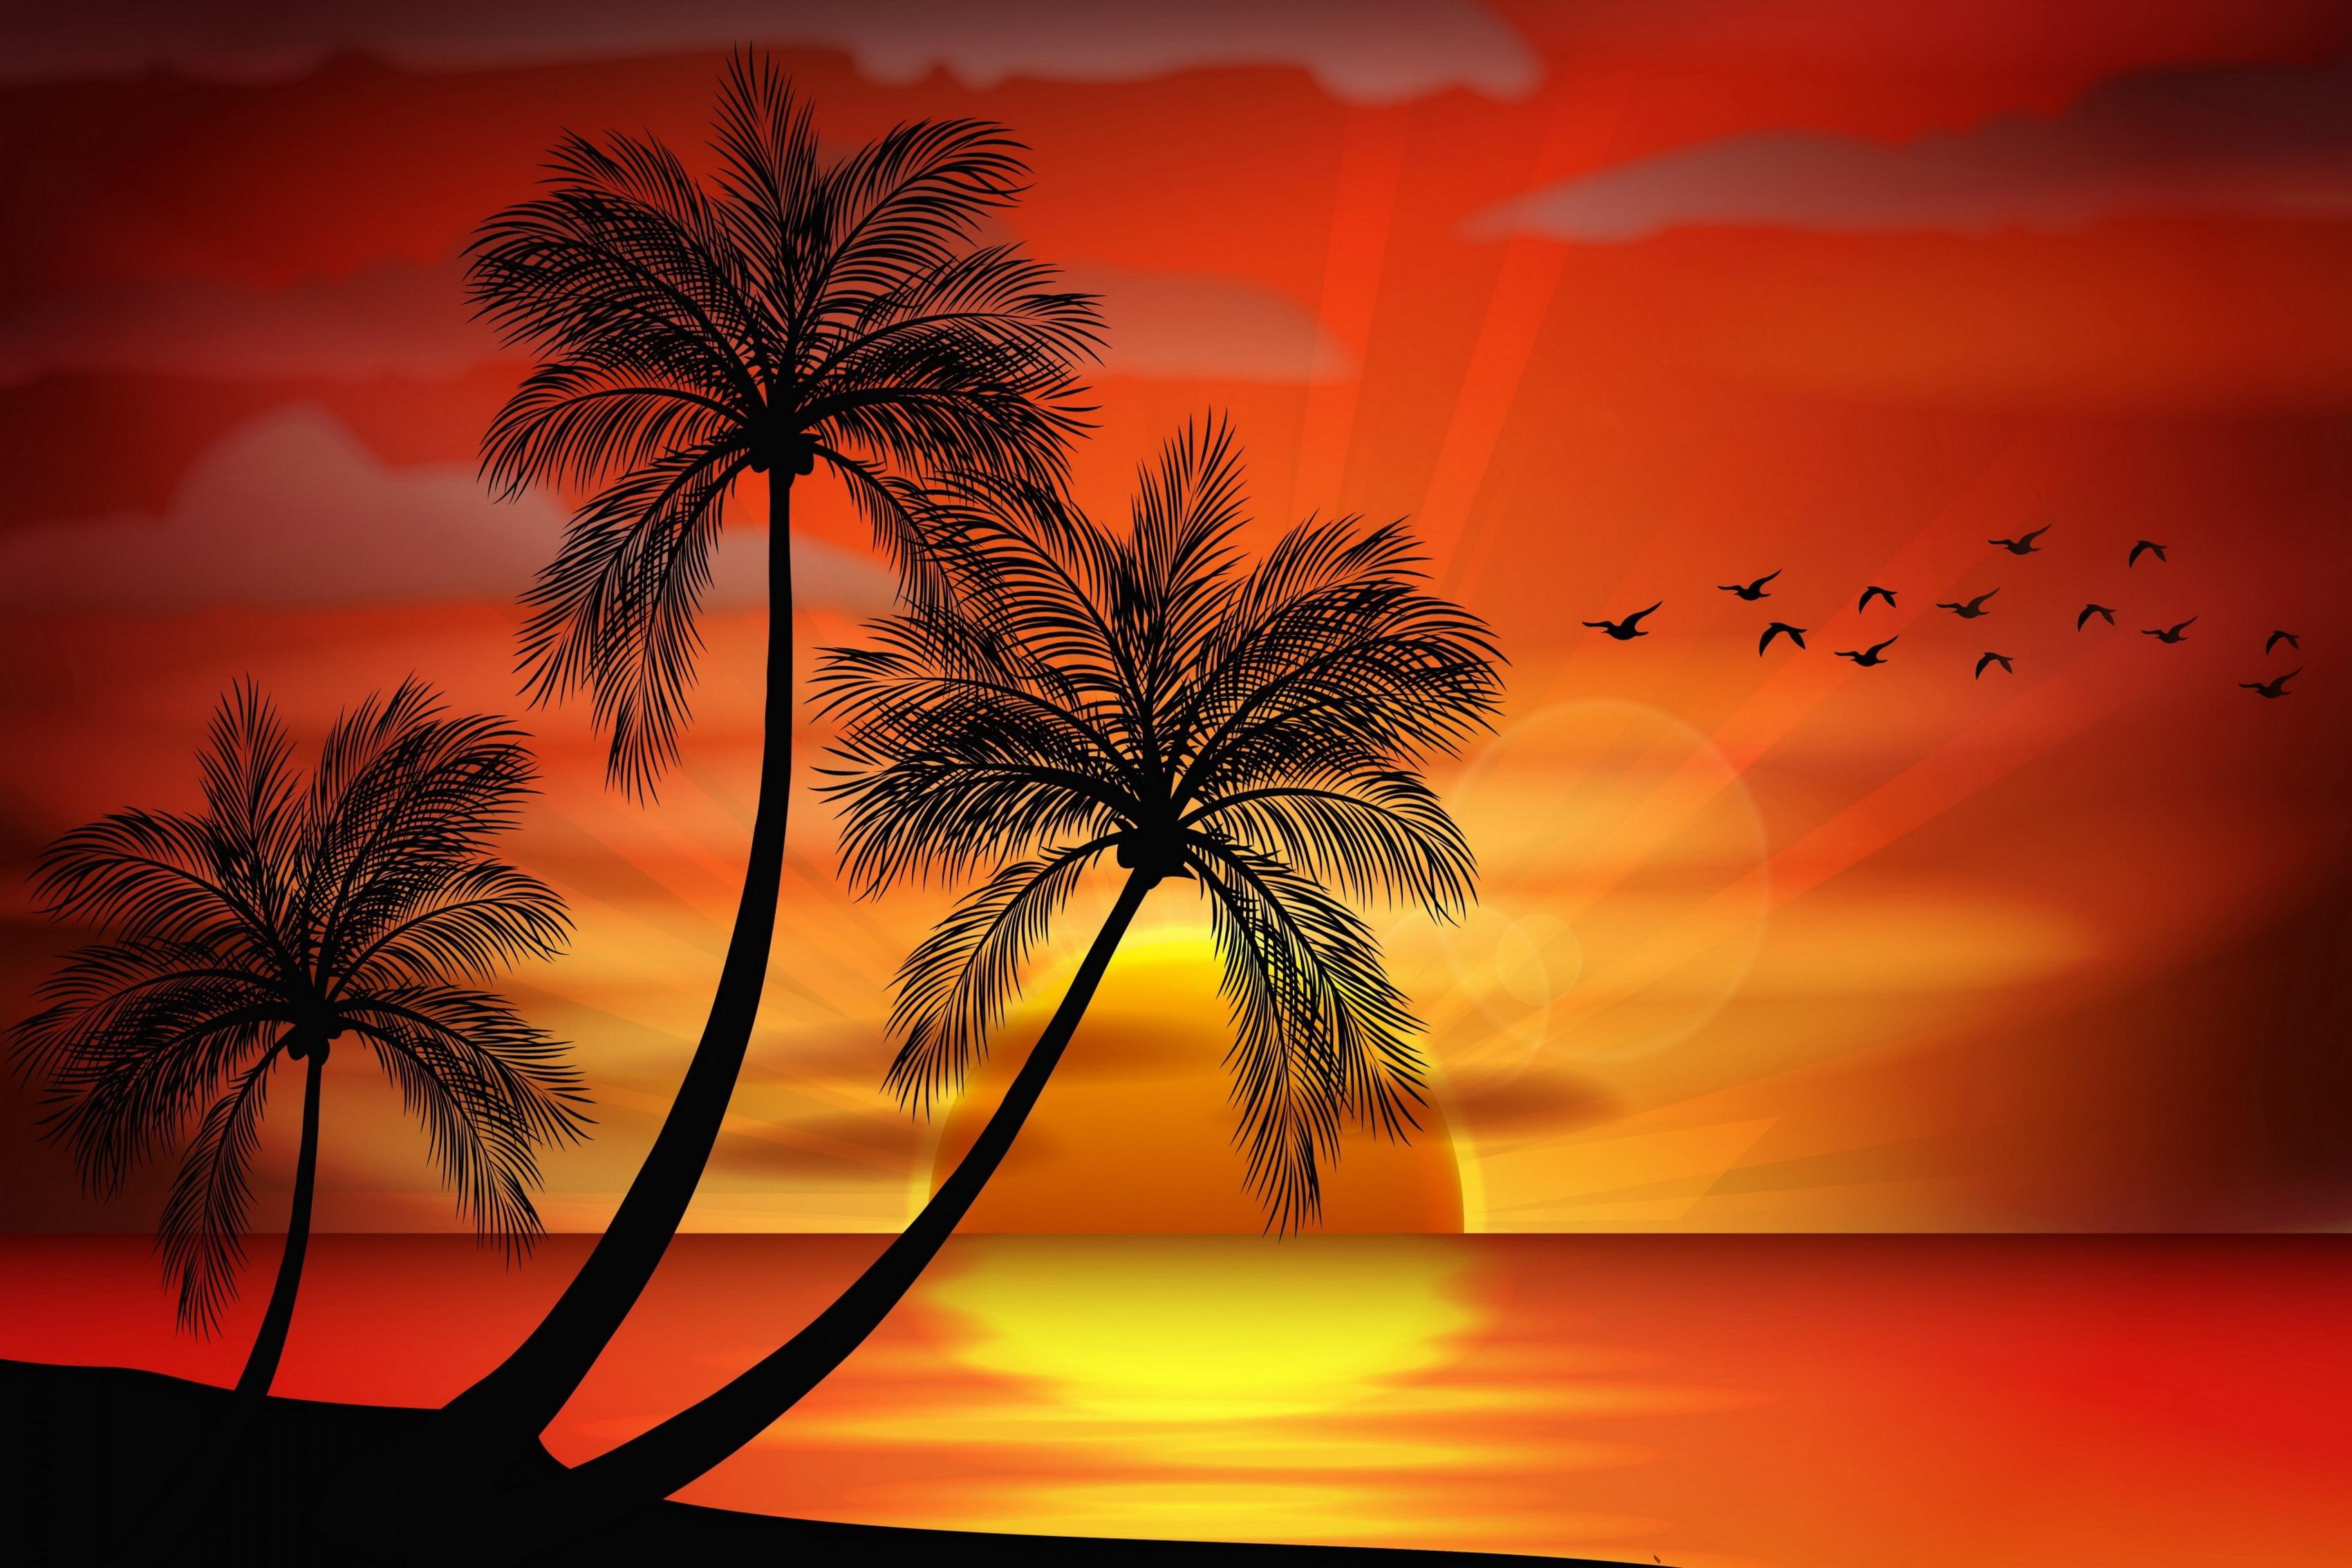 Online Get Cheap Palm Island Aliexpresscom Alibaba Group - palm island home decor